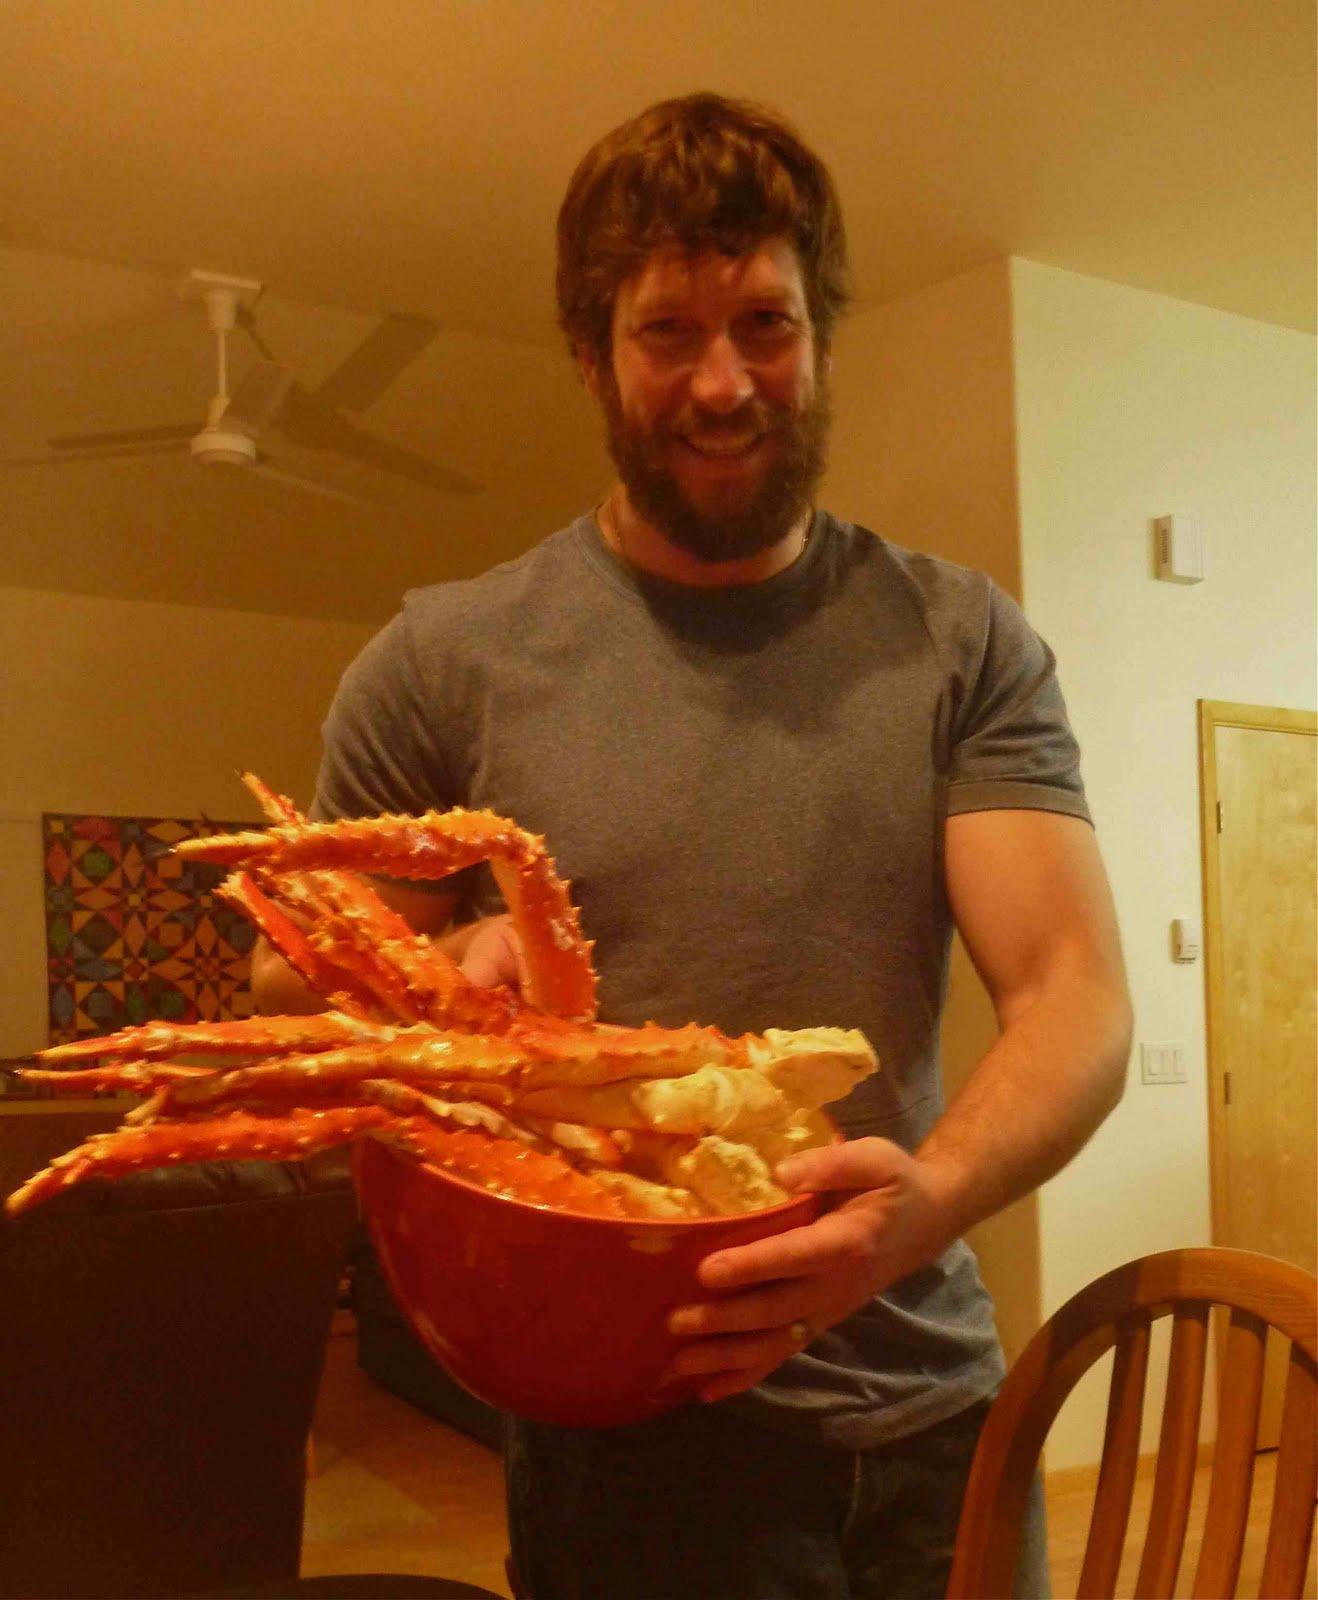 Giant King Crabs Giant Alaskan King Crab Legs